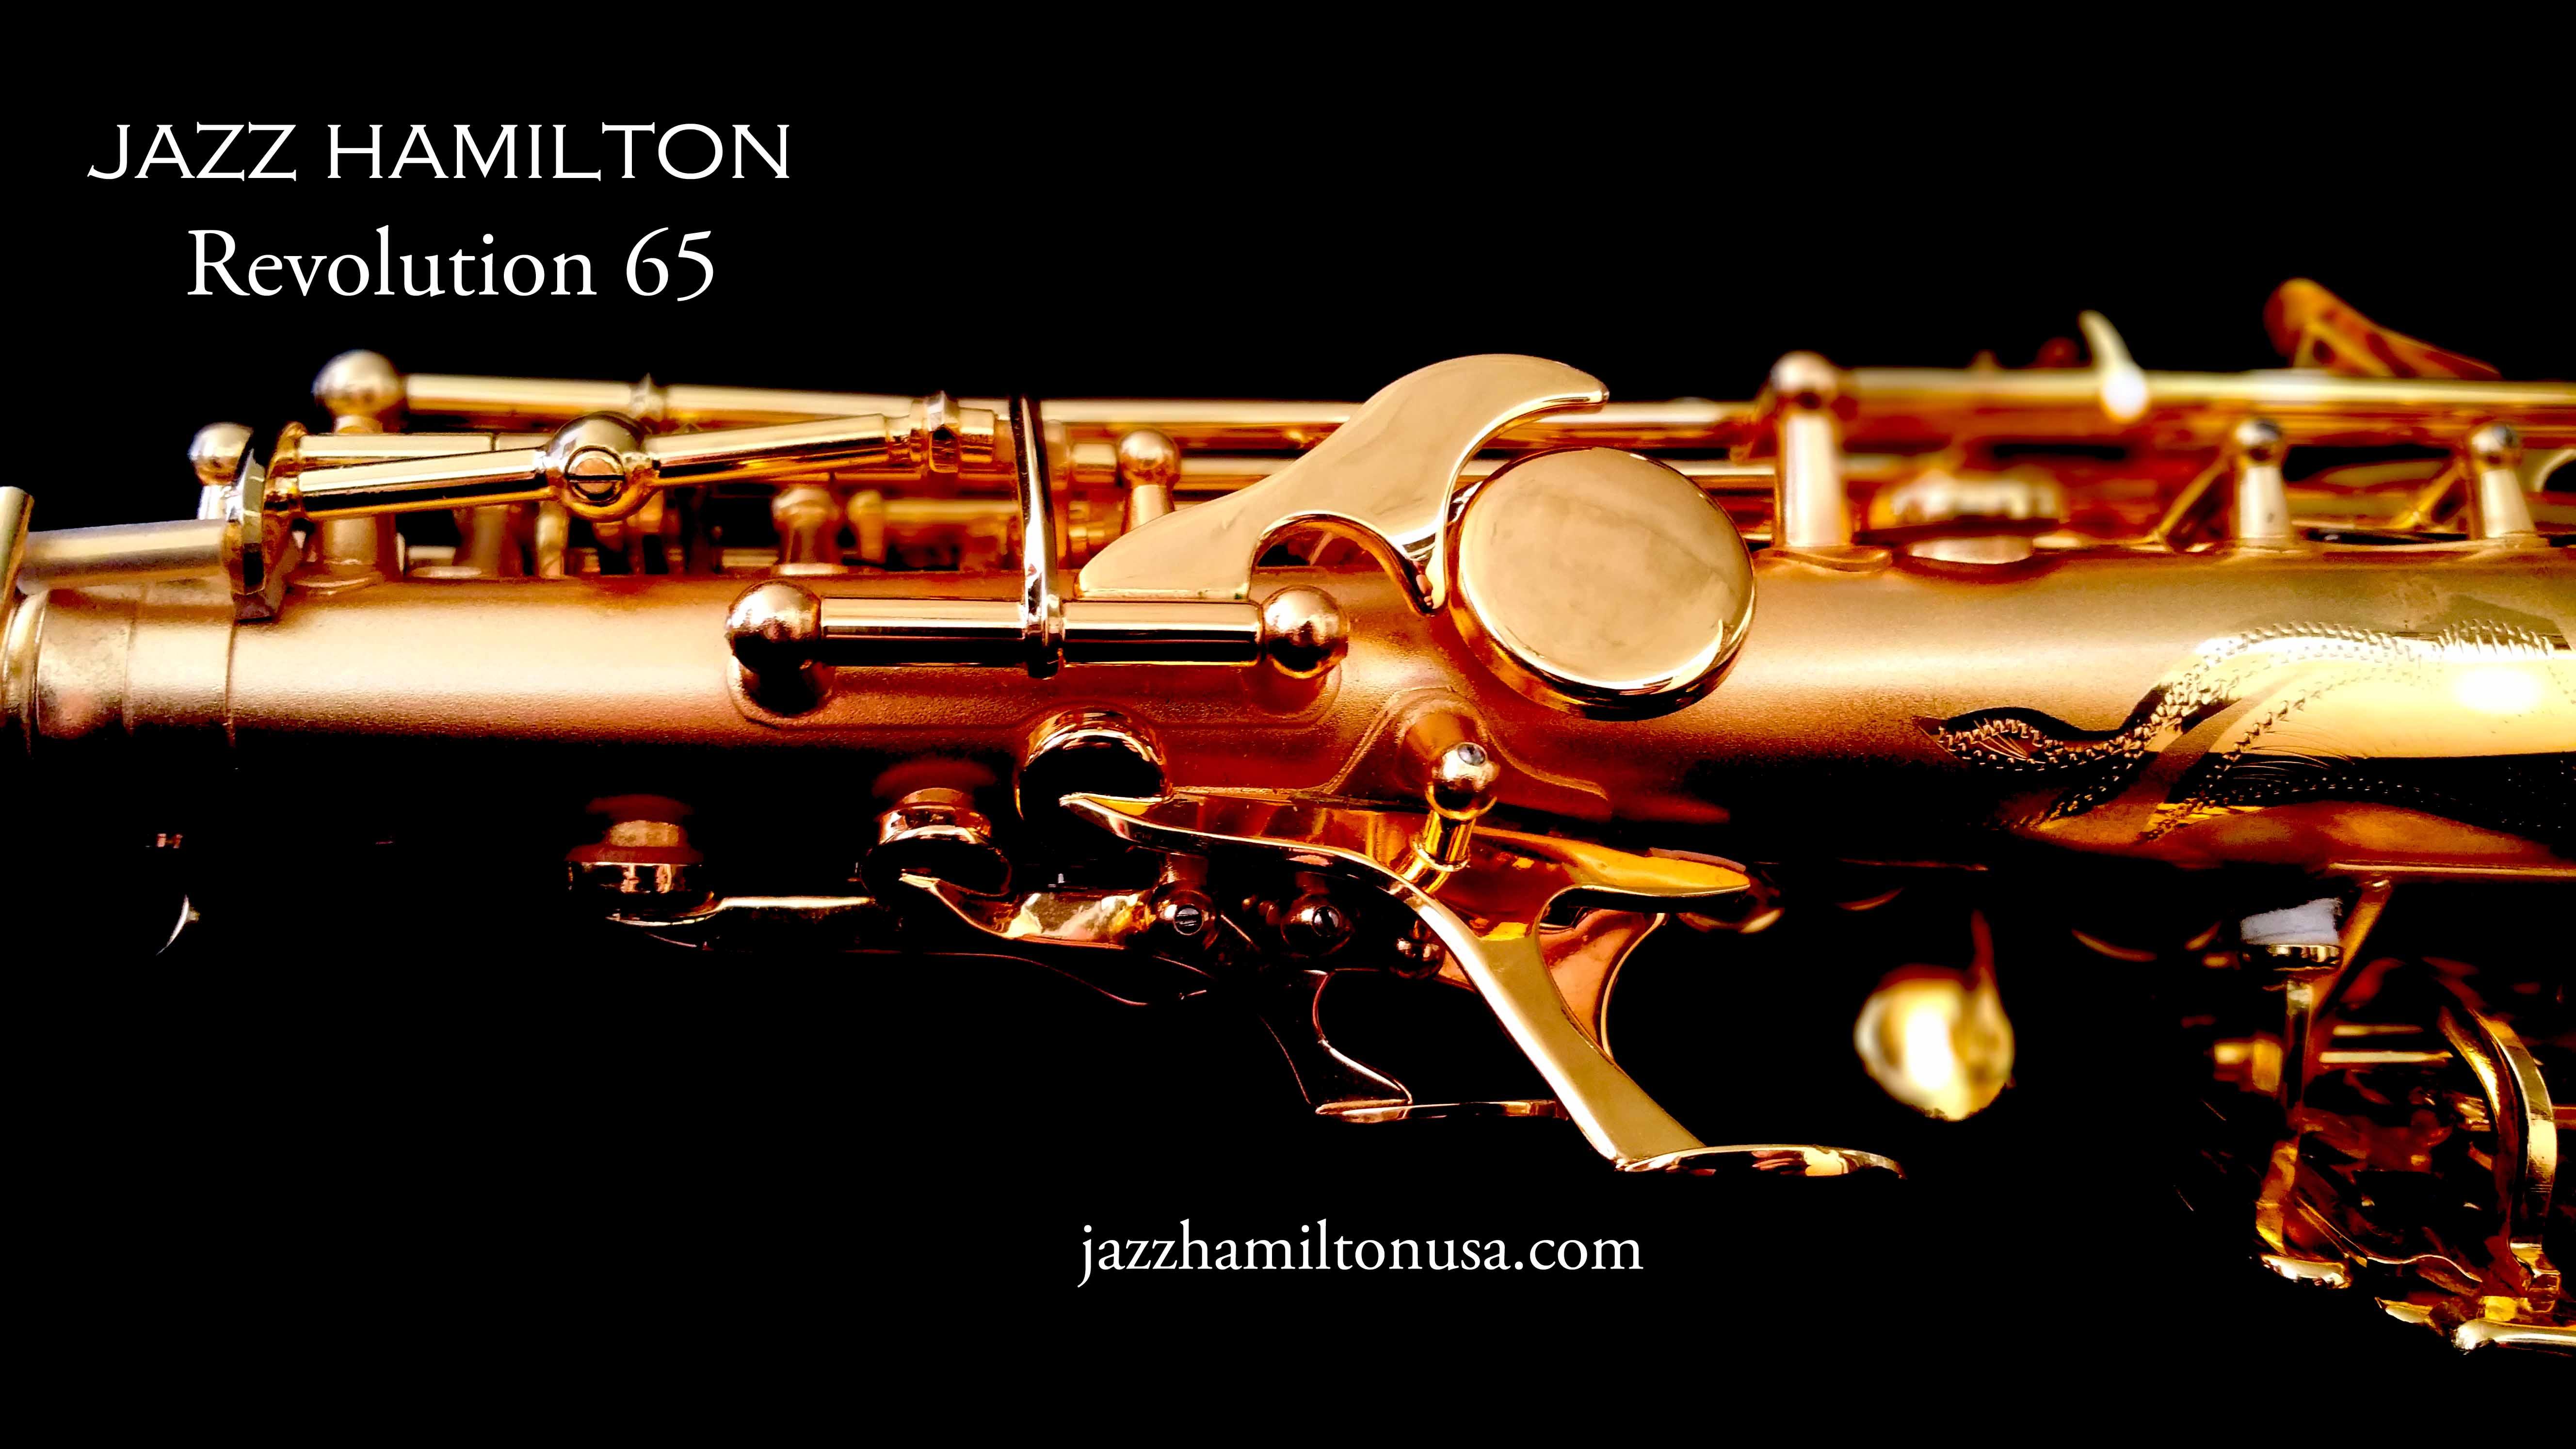 http://jazzhamiltonusa.com/wp-content/uploads/2016/08/soprano-web-2.jpg